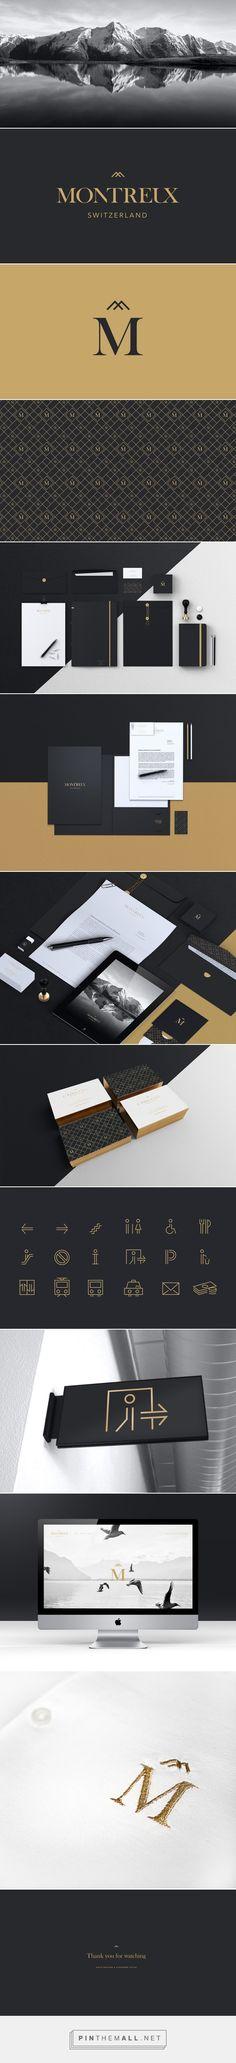 Montreux | Branding on Behance - created via https://pinthemall.net